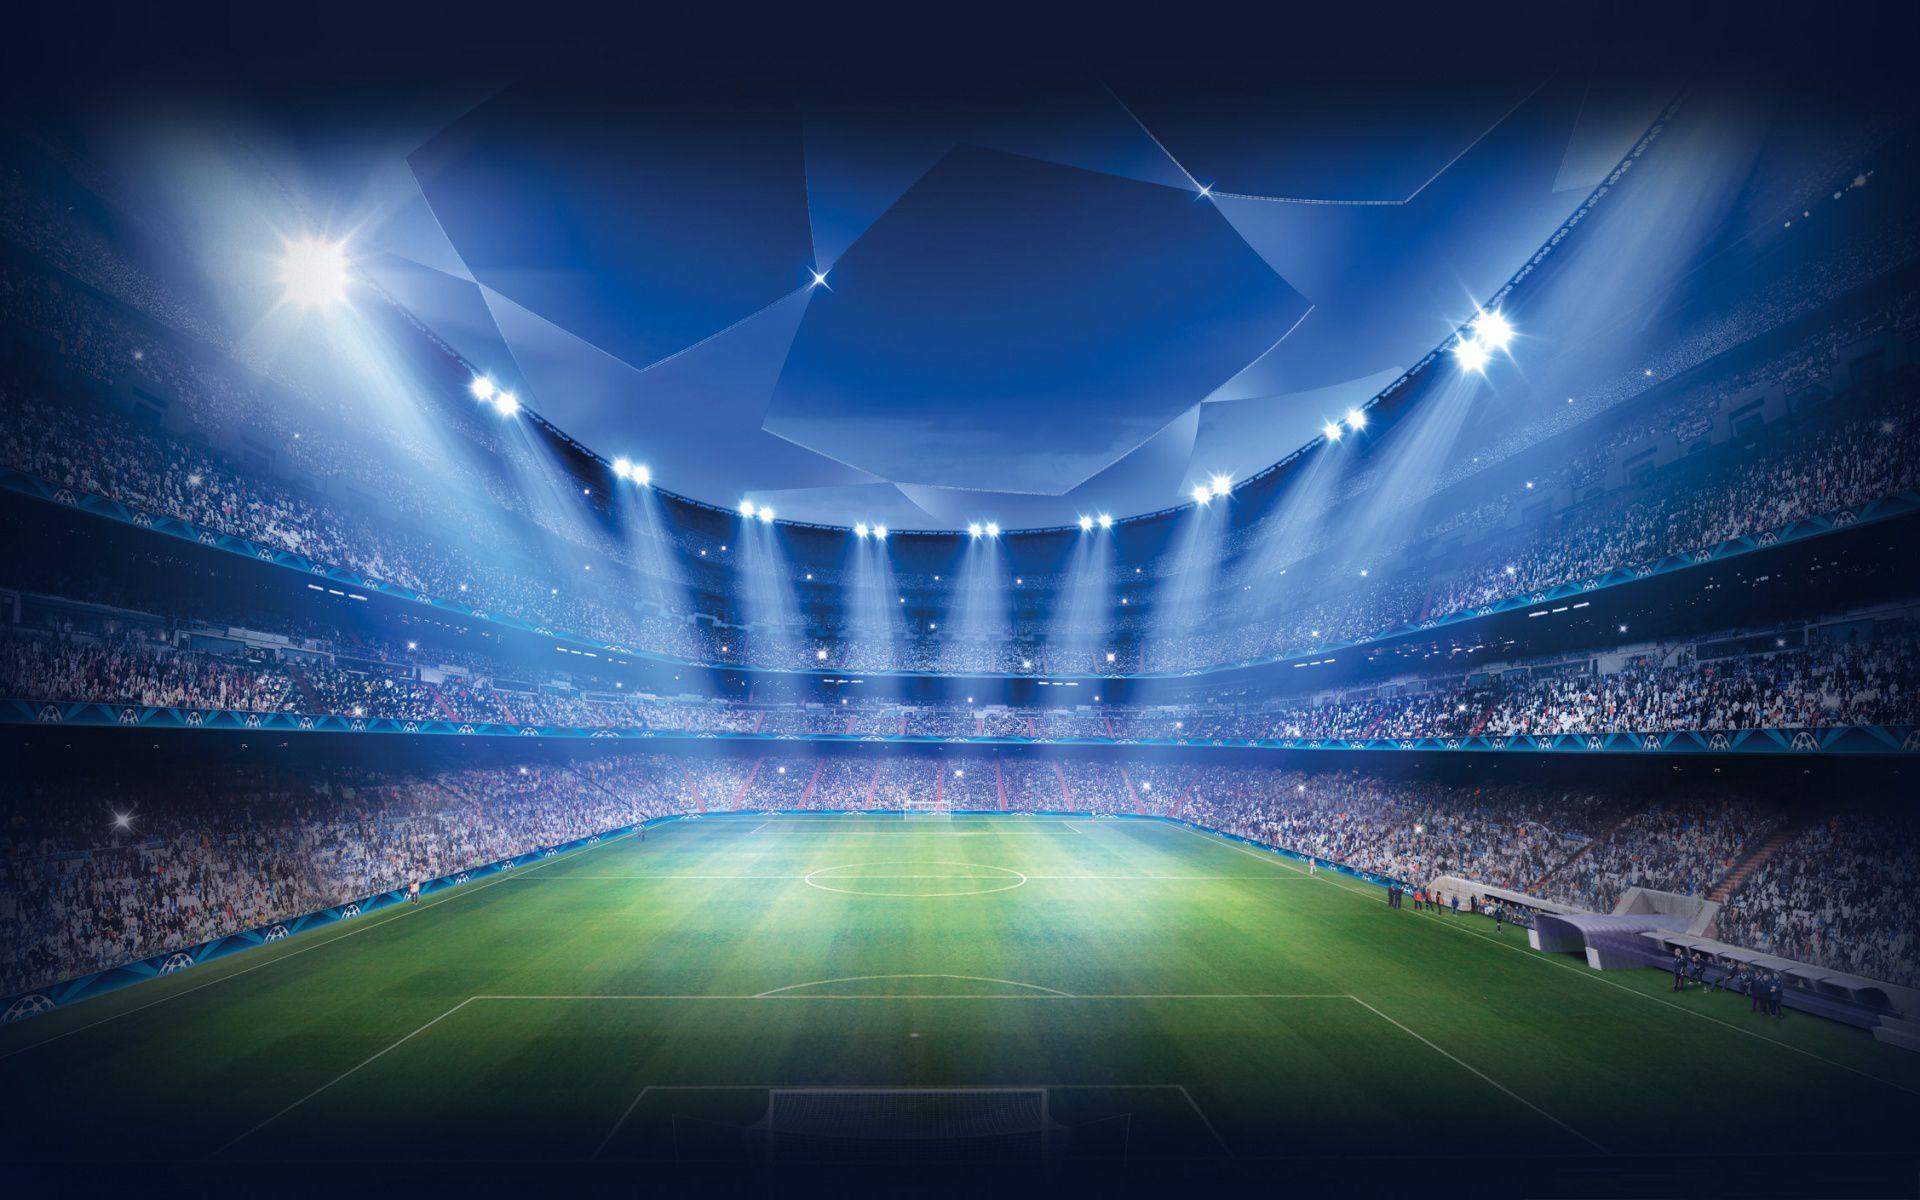 football stadium wallpapers top free football stadium backgrounds wallpaperaccess football stadium wallpapers top free